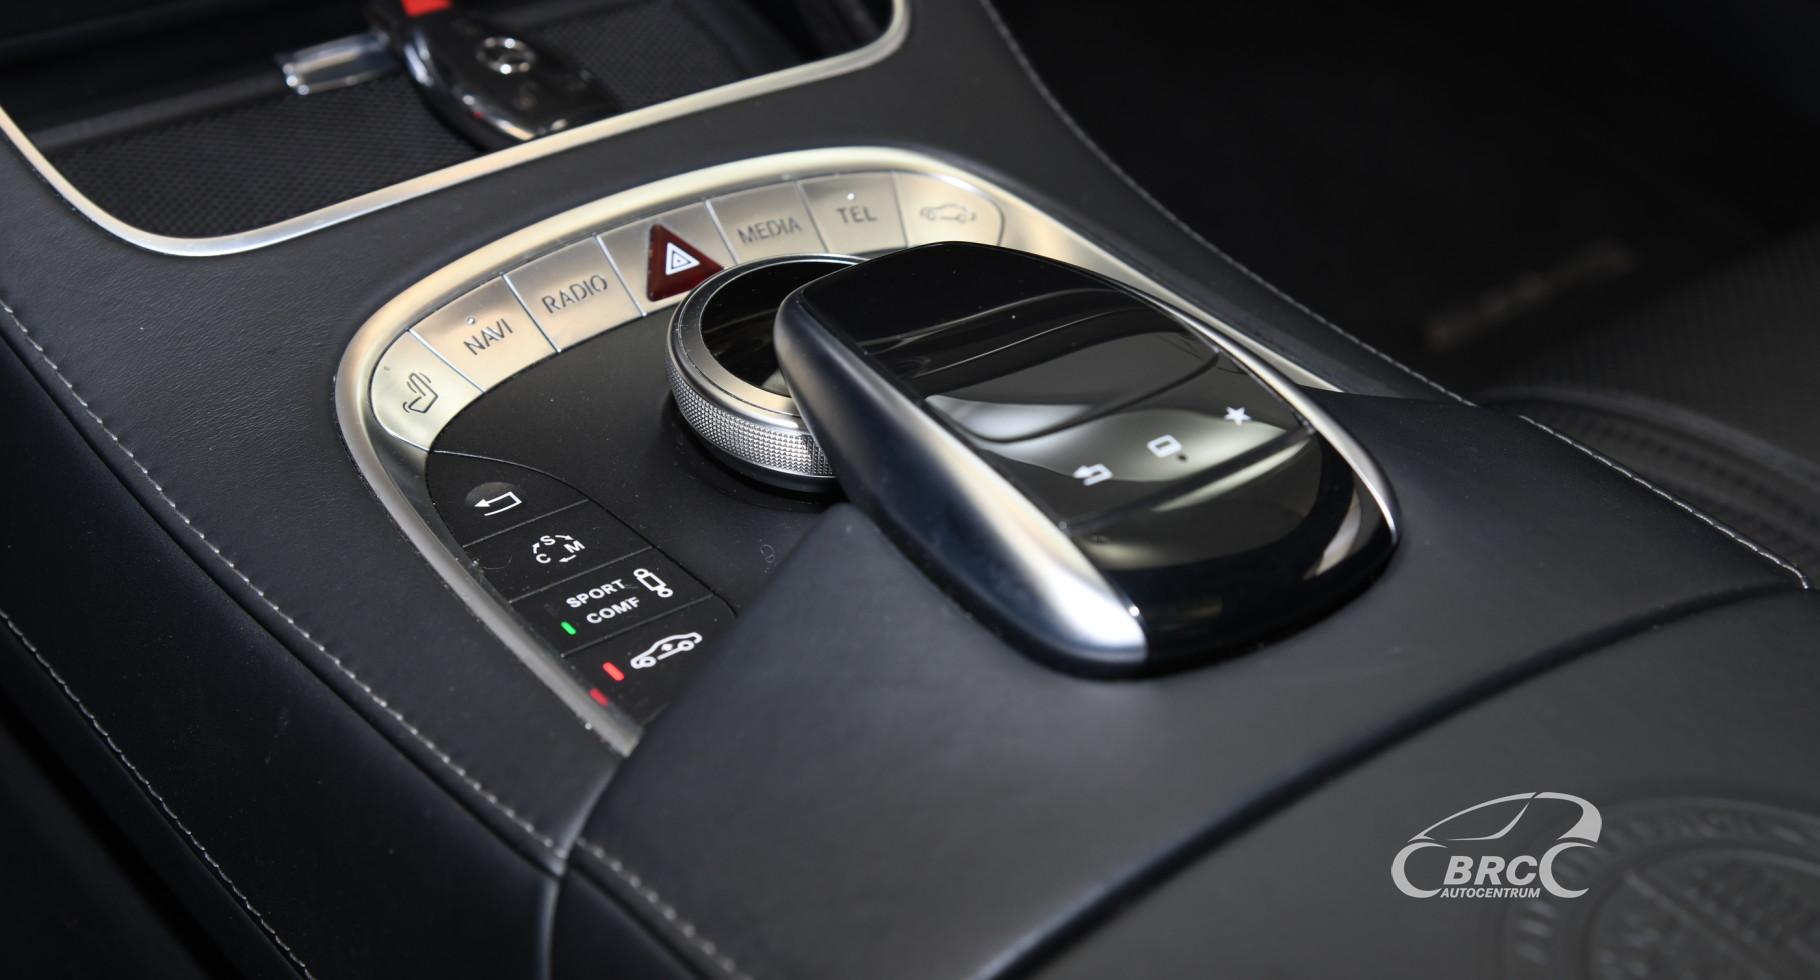 Mercedes-Benz S 63 AMG V8 BiTurbo Long Automatas